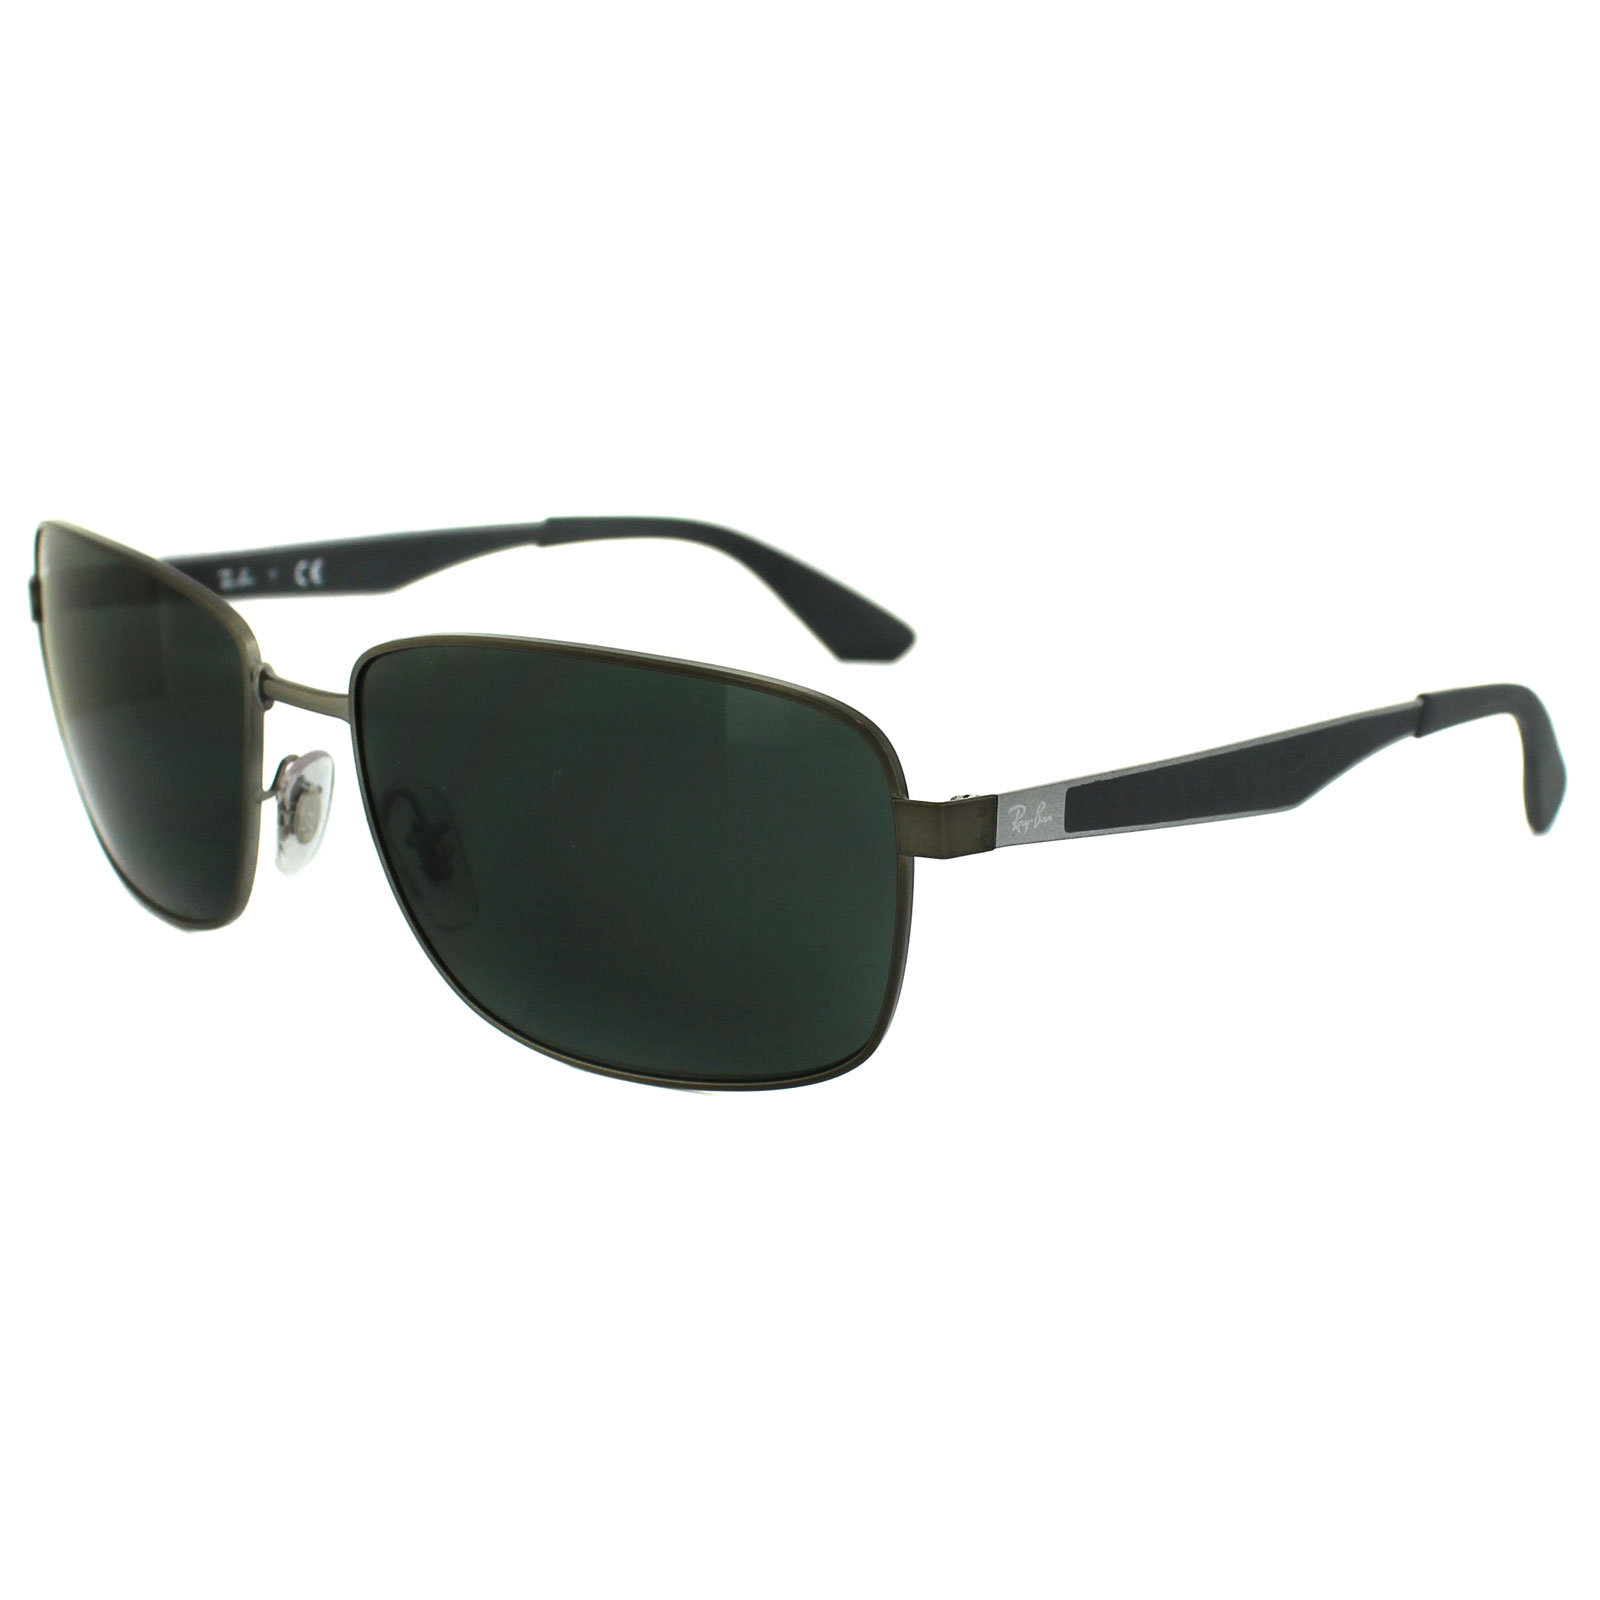 ray ban sunglasses gunmetal  ray ban sunglasses 3529 029/71 gunmetal green